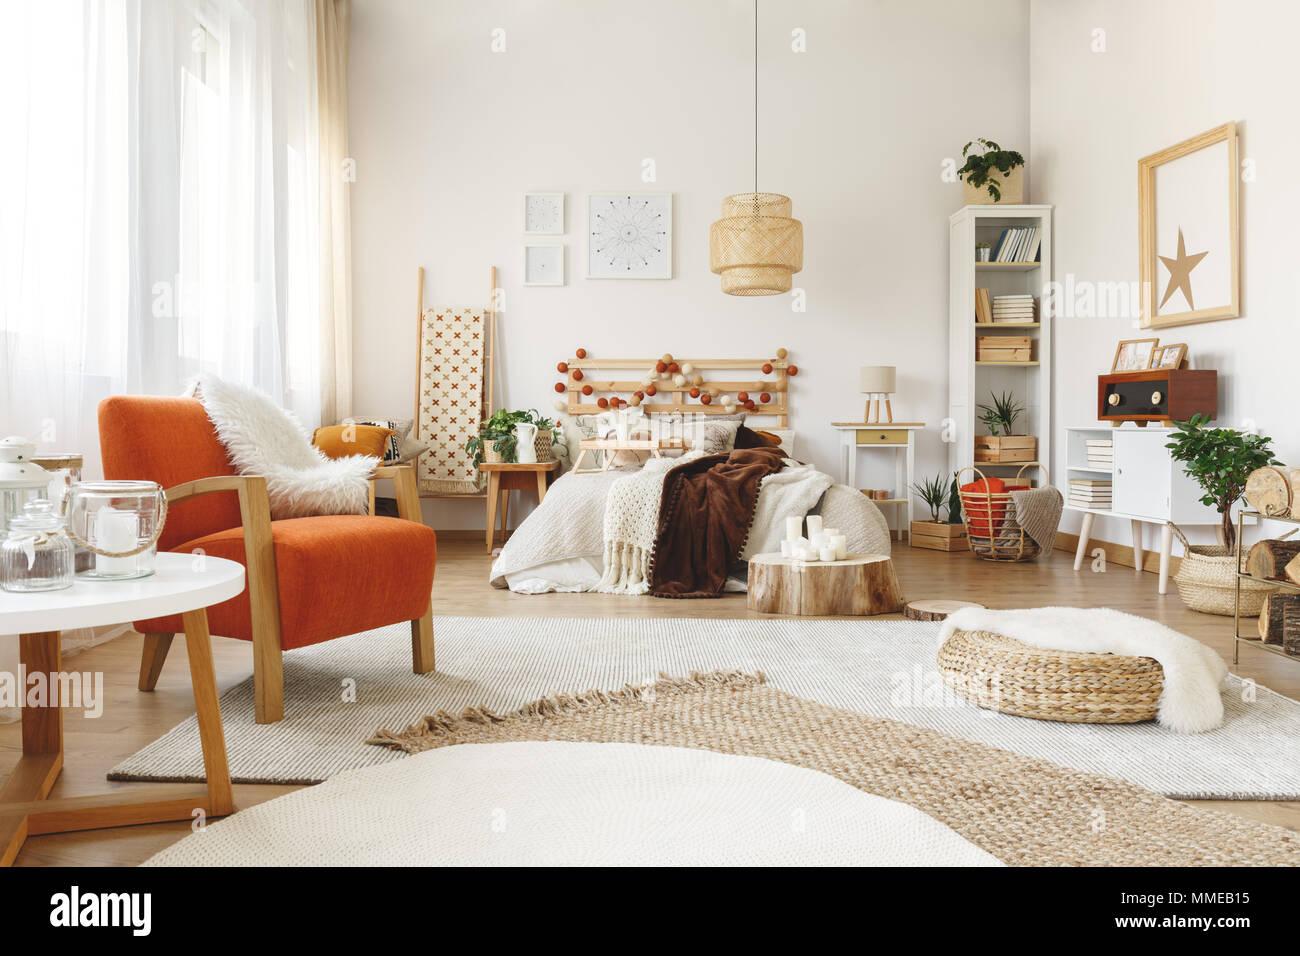 Grande comode sedie di colore arancione in una luminosa camera da ...